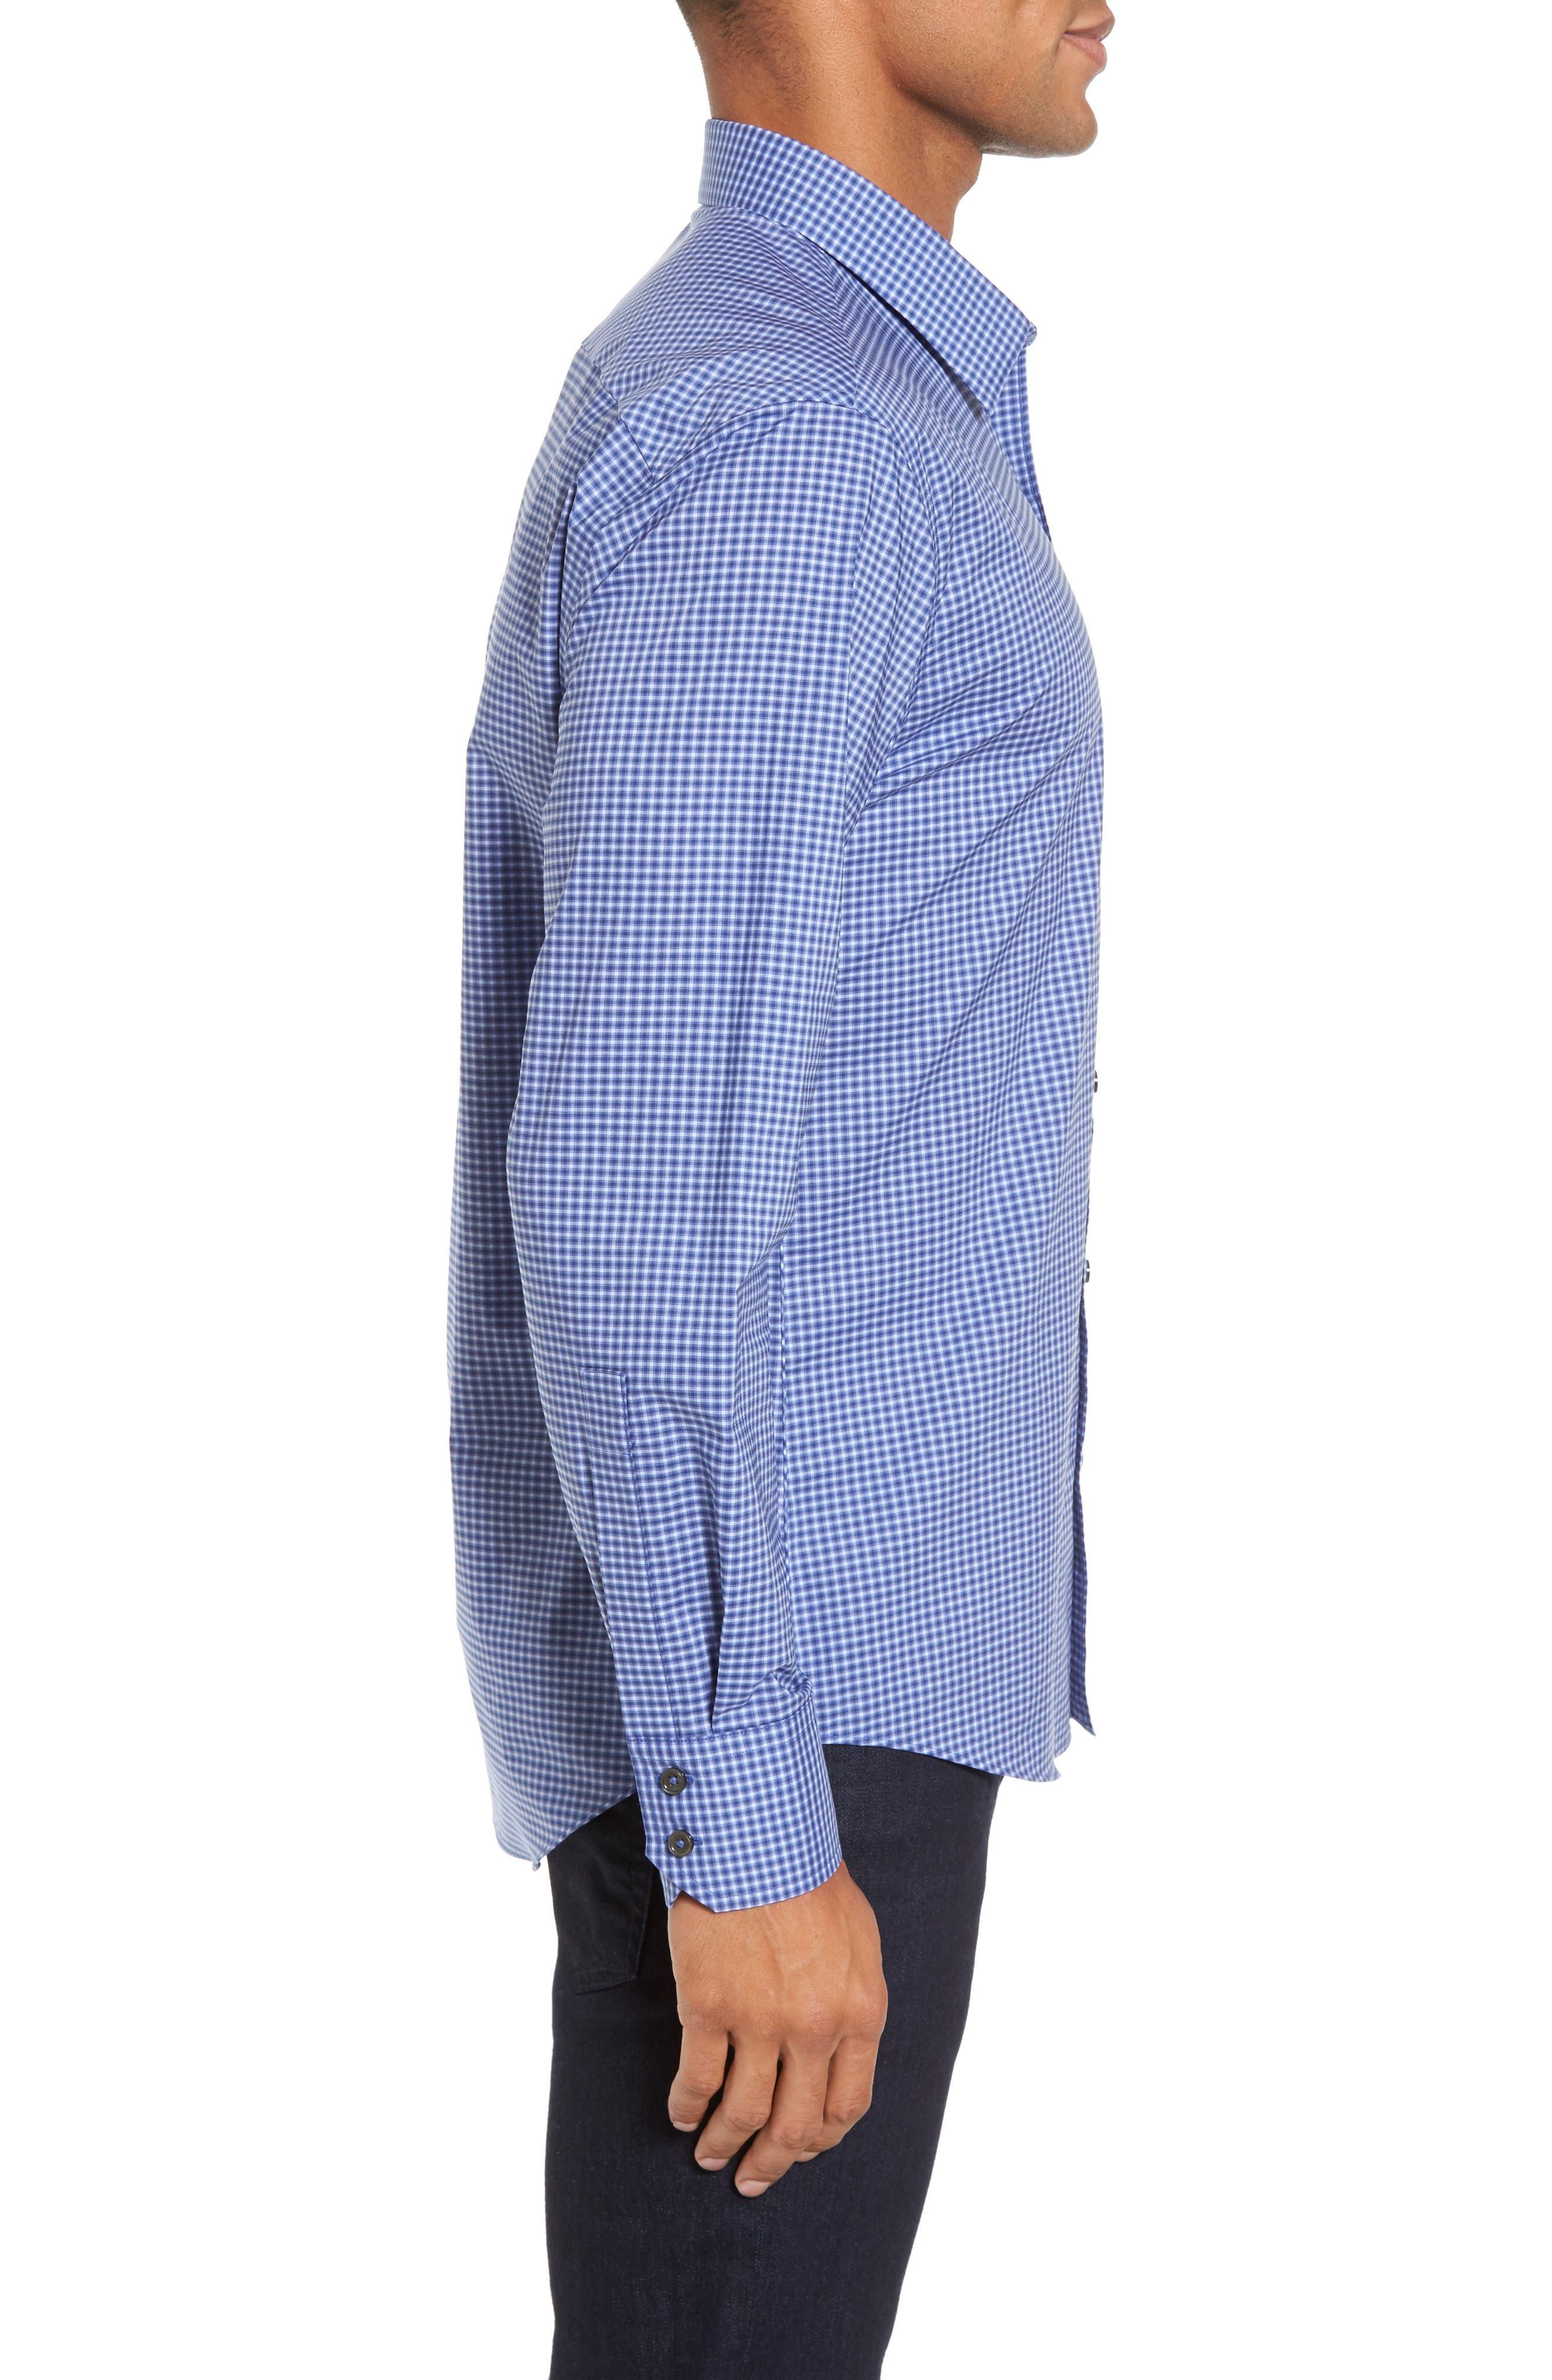 ZACHARY PRELL, Ramon Regular Fit Mini Check Sport Shirt, Alternate thumbnail 3, color, BLUE